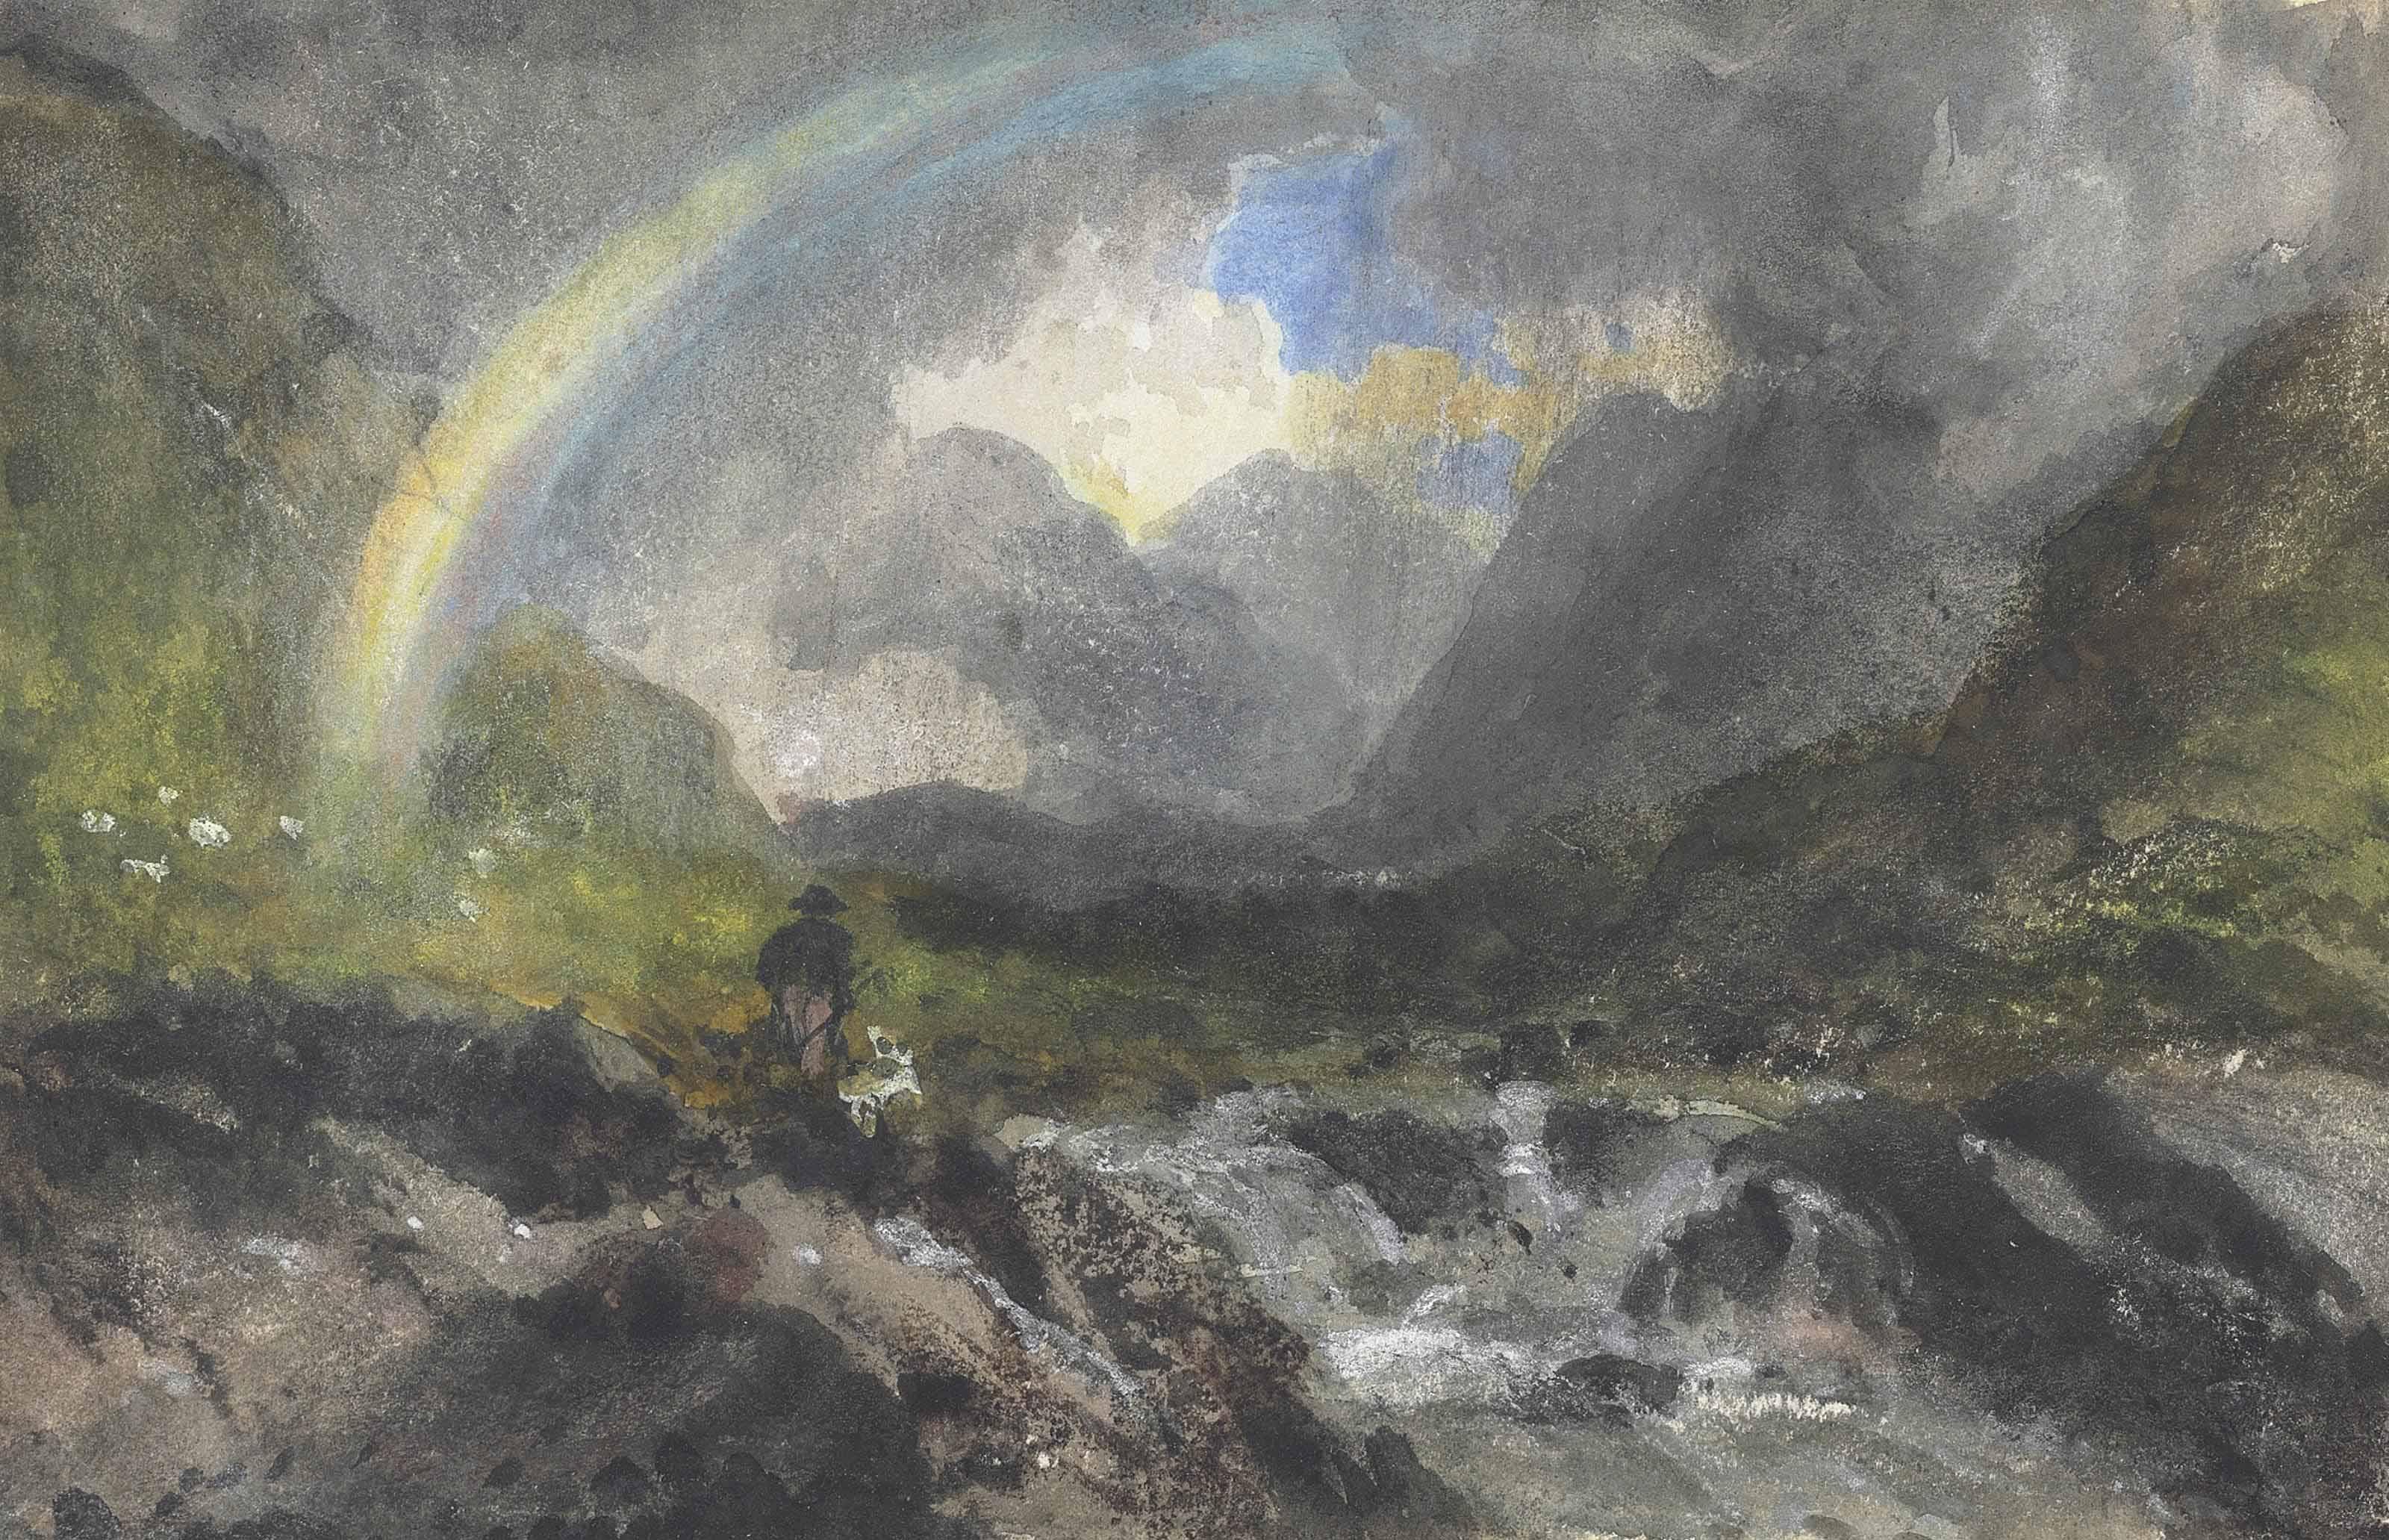 A mountainous river landscape with a rainbow